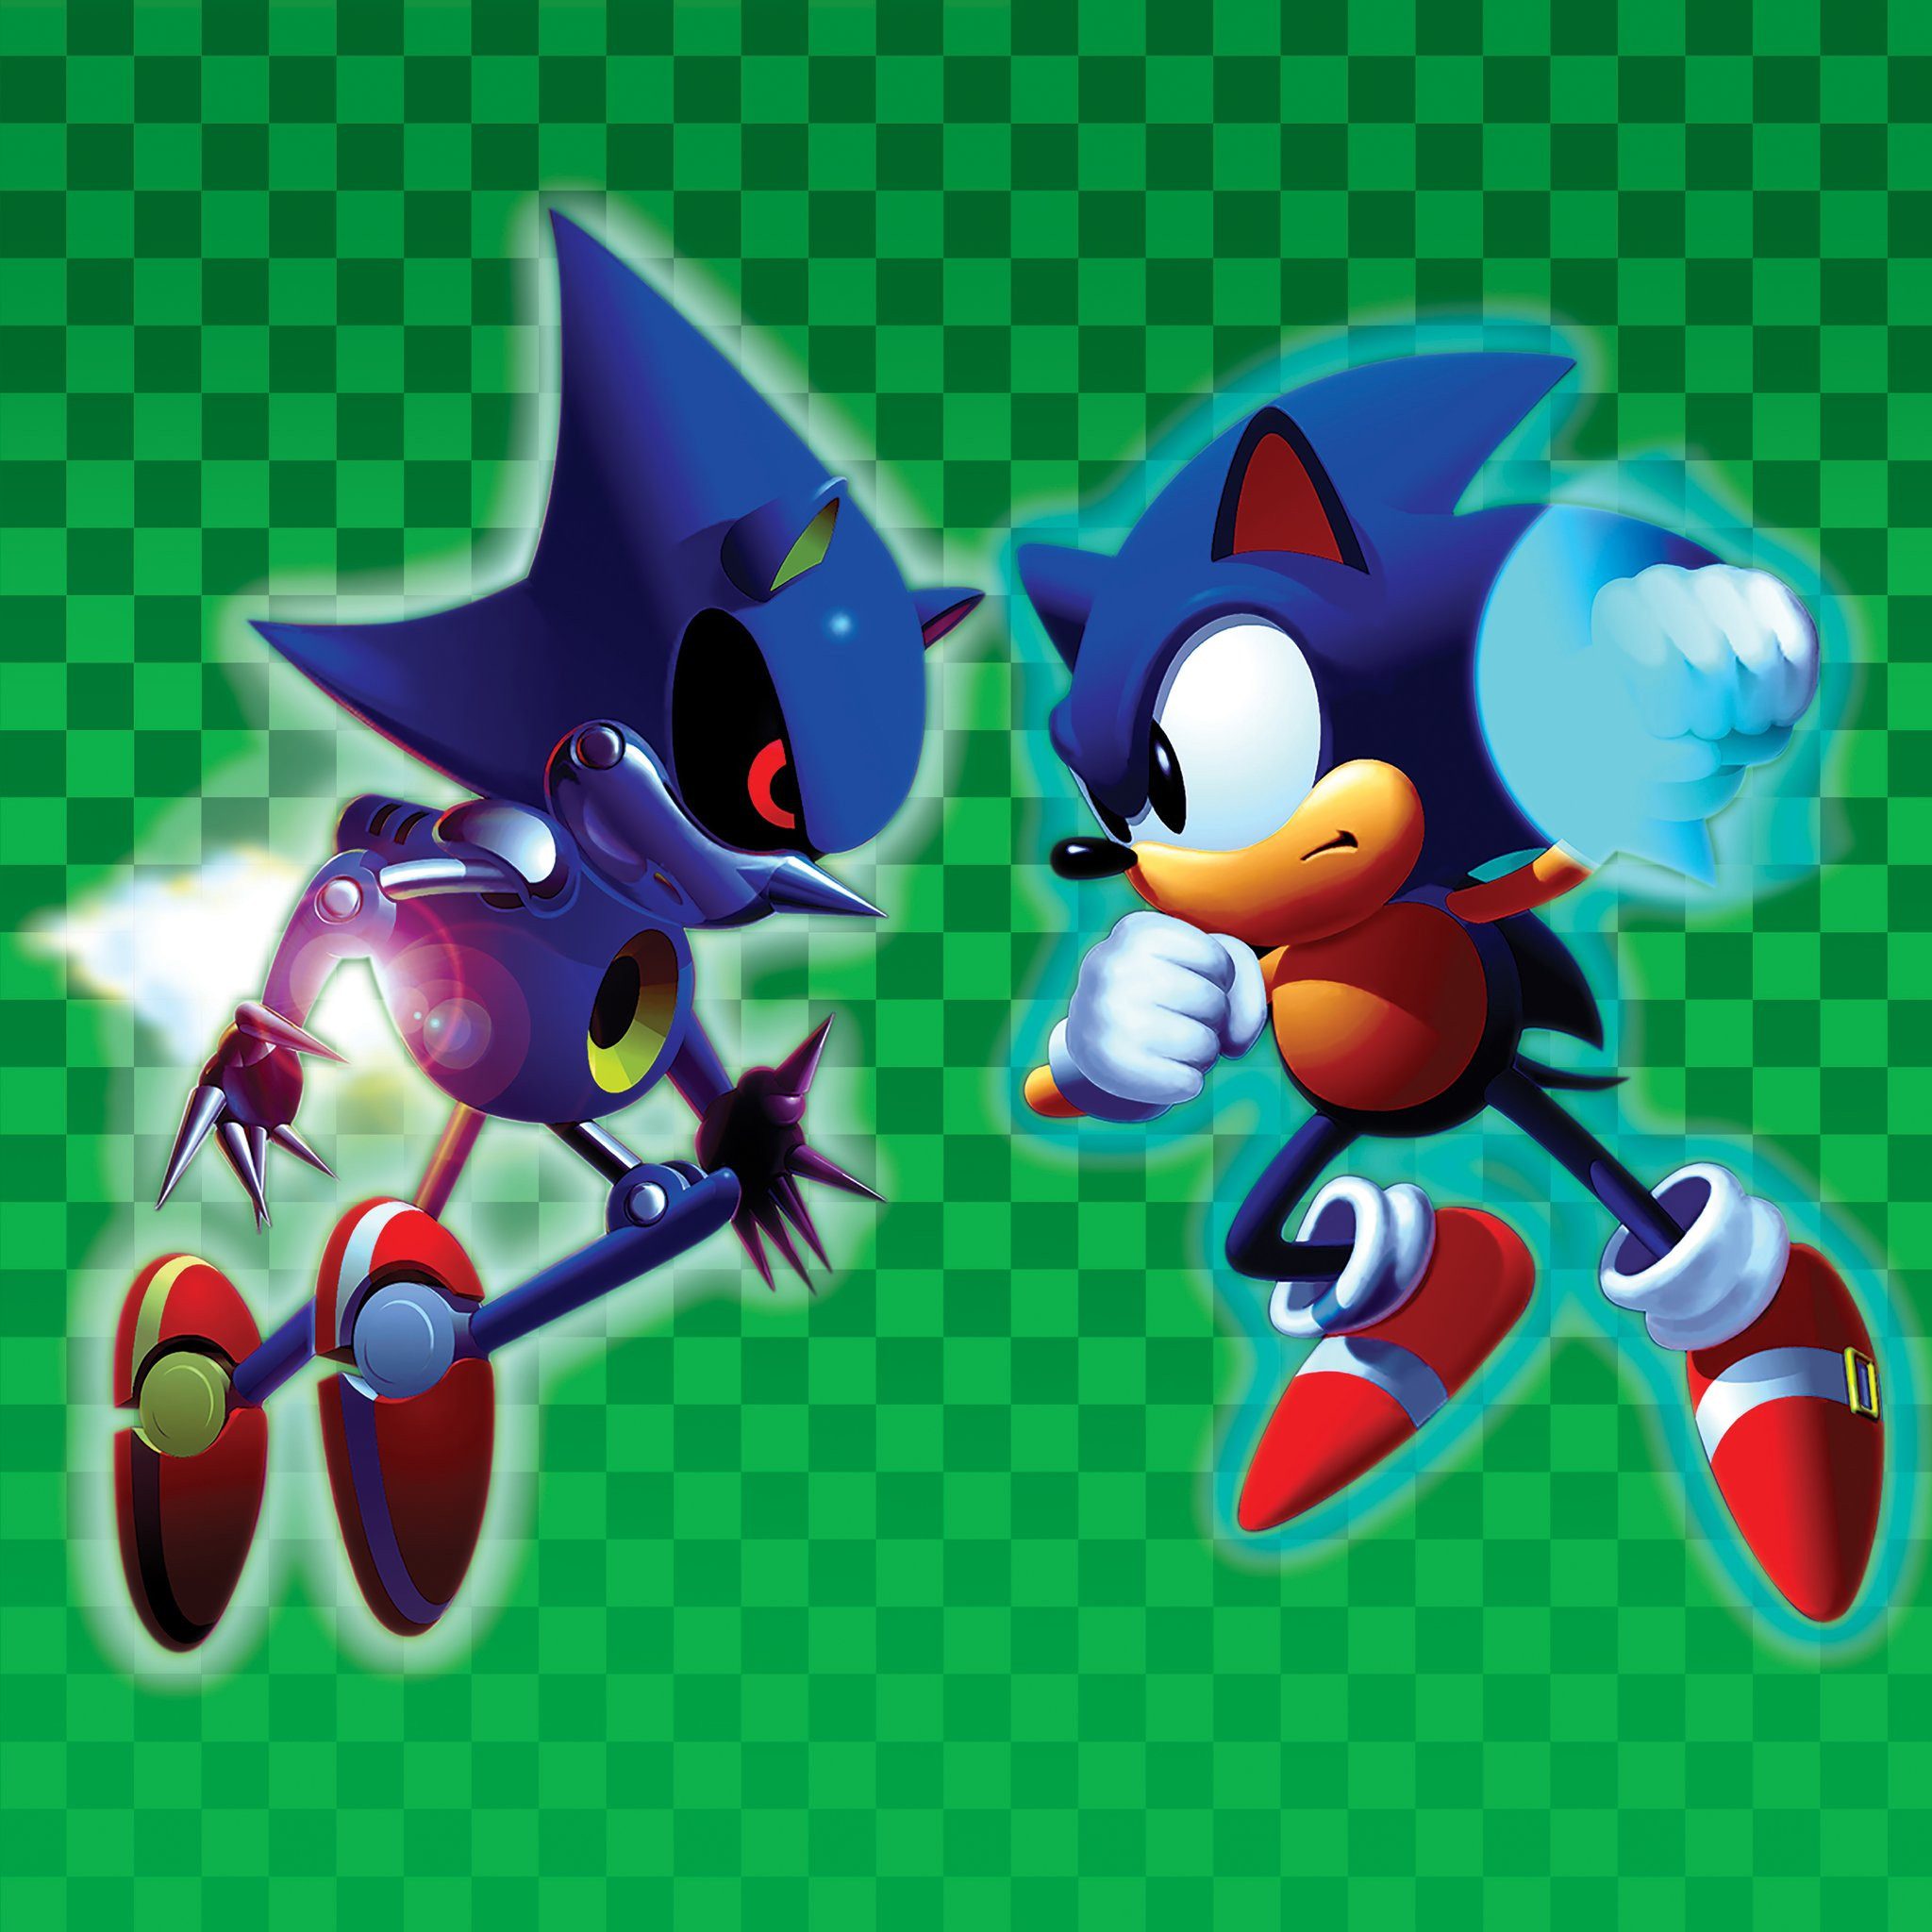 NAOFUMI HATAYA AND MASFUMI OGATA: Sonic CD (aka Sonic The Hedgehog